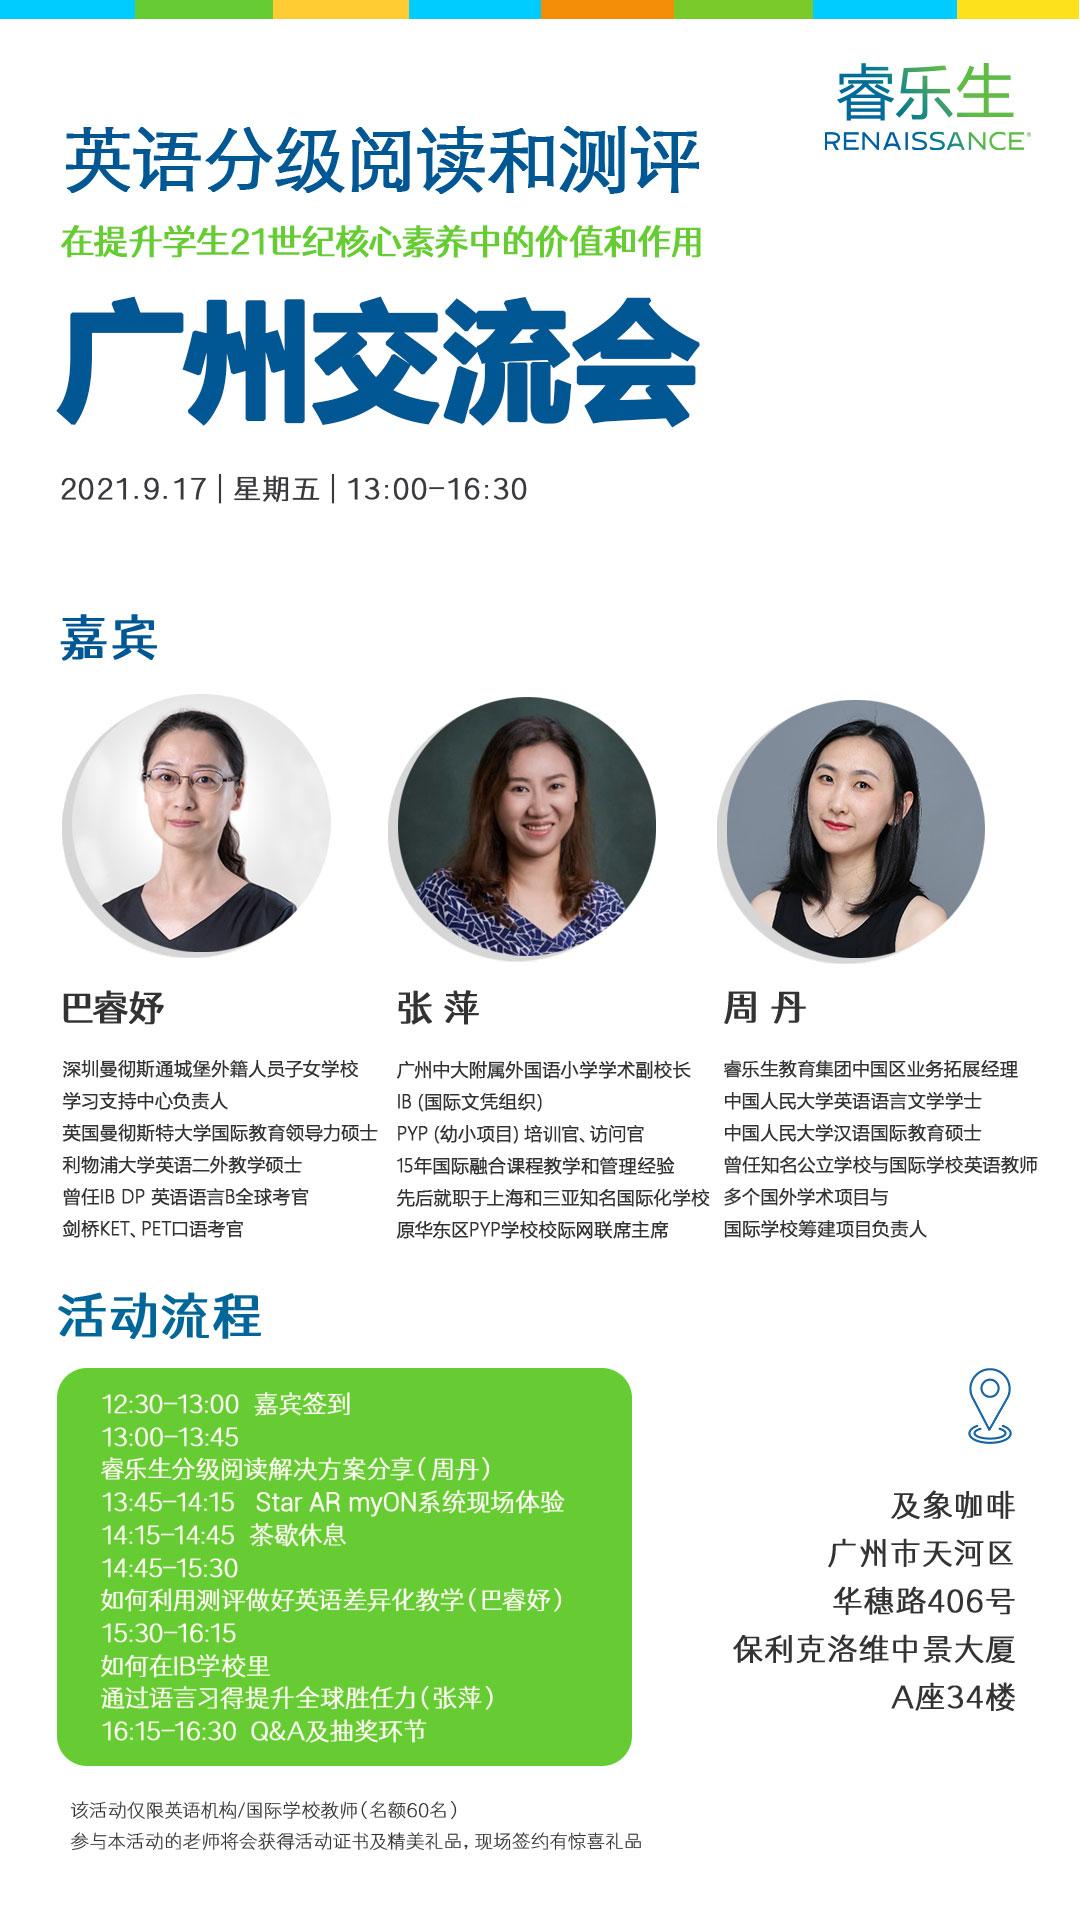 myON暑期阅读计划冠军——慈溪市文谷外国语小学月读3万分钟